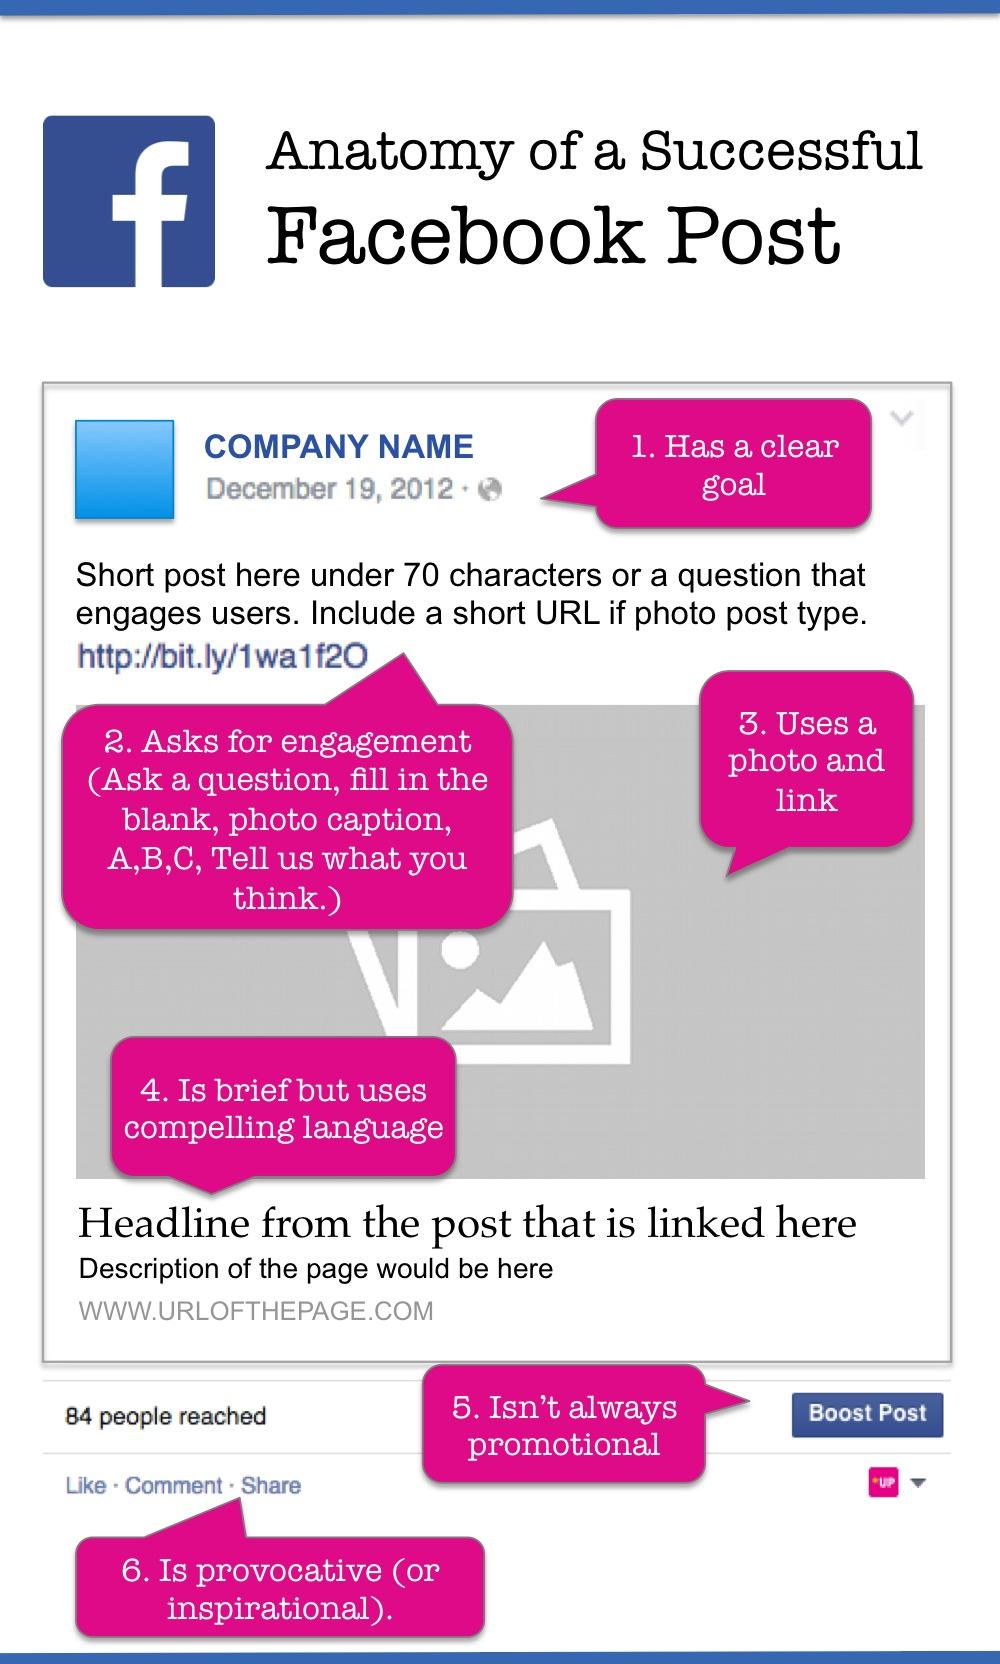 blog-post-image-captions